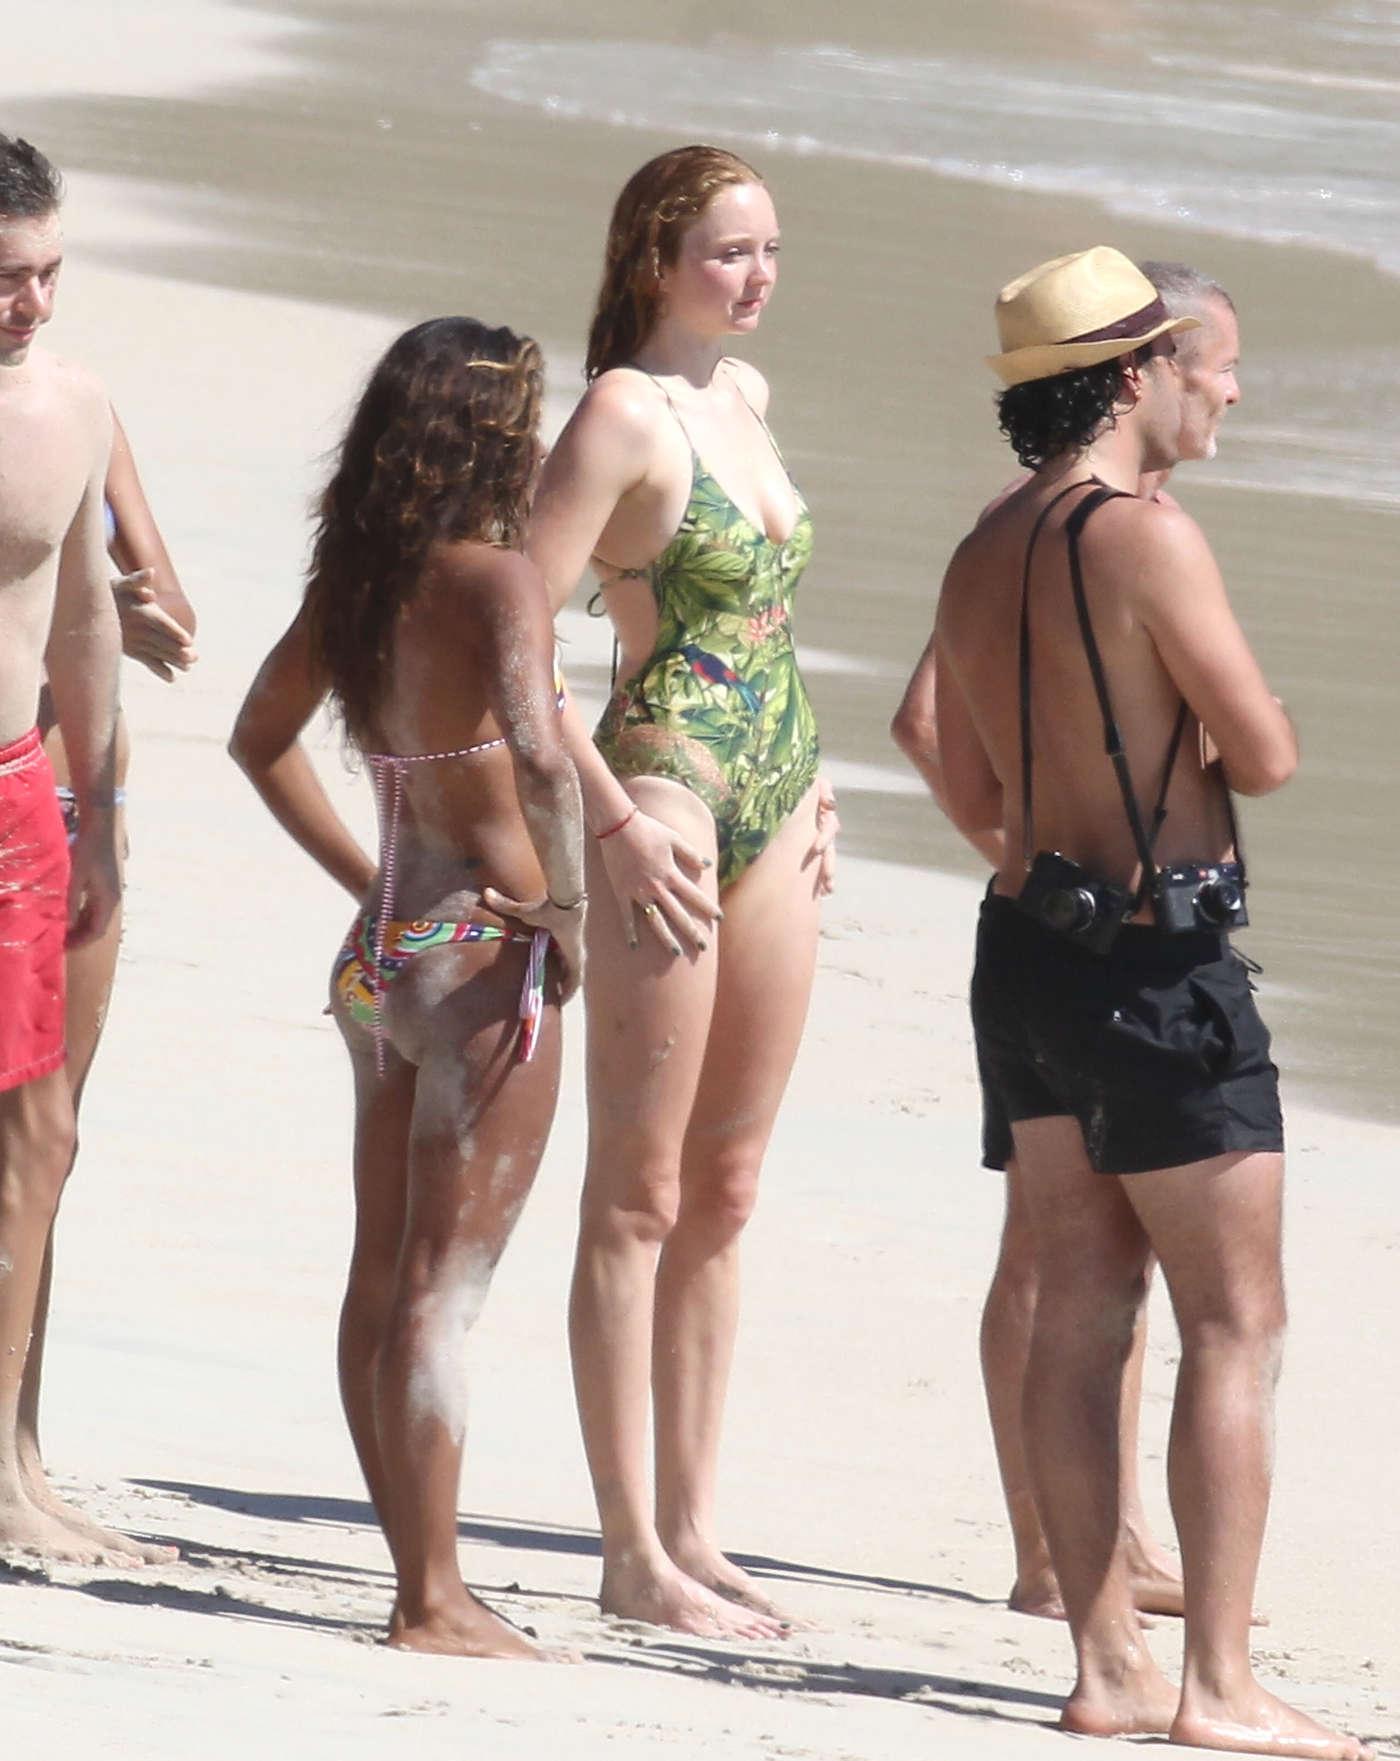 Bikini Lily Cole nudes (78 photos), Sexy, Paparazzi, Twitter, lingerie 2020